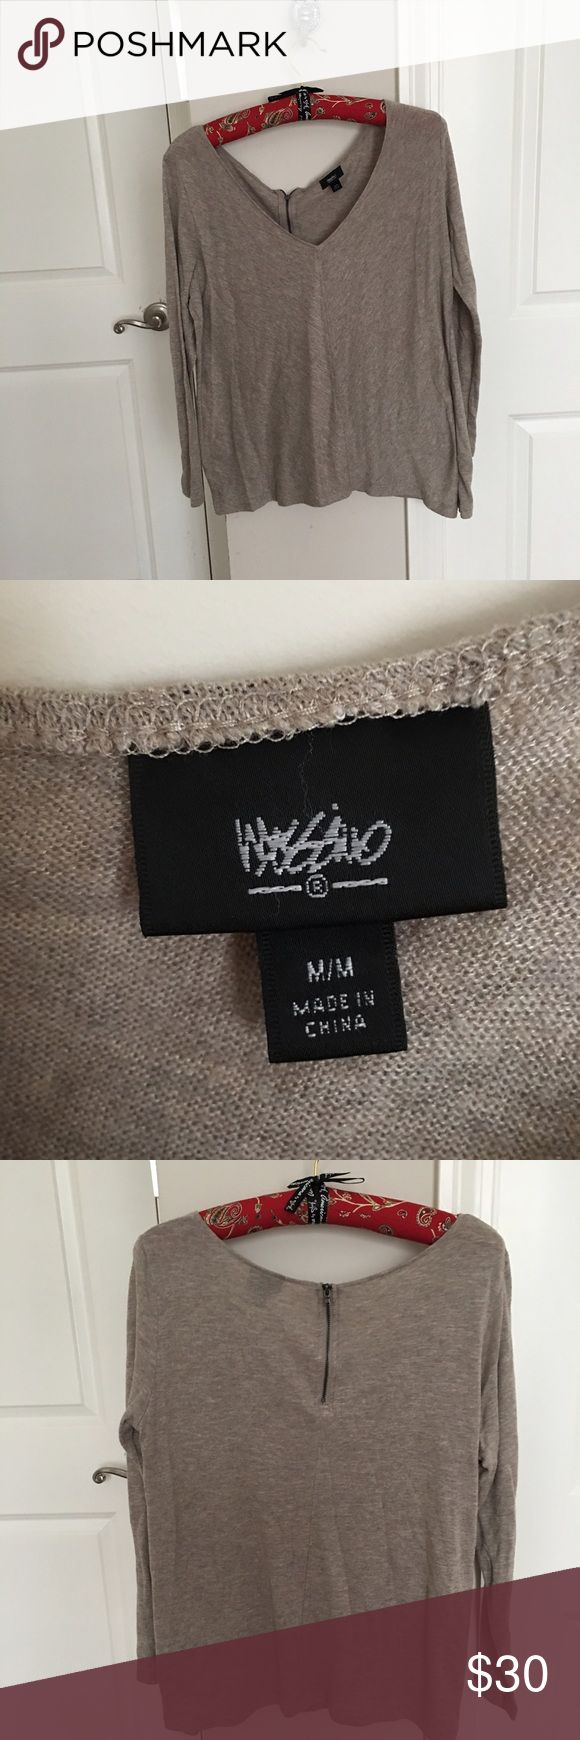 Dark Beige Long Sleeve Top Massimo Shirt with Zipper on Backside Massimo Tops Blouses